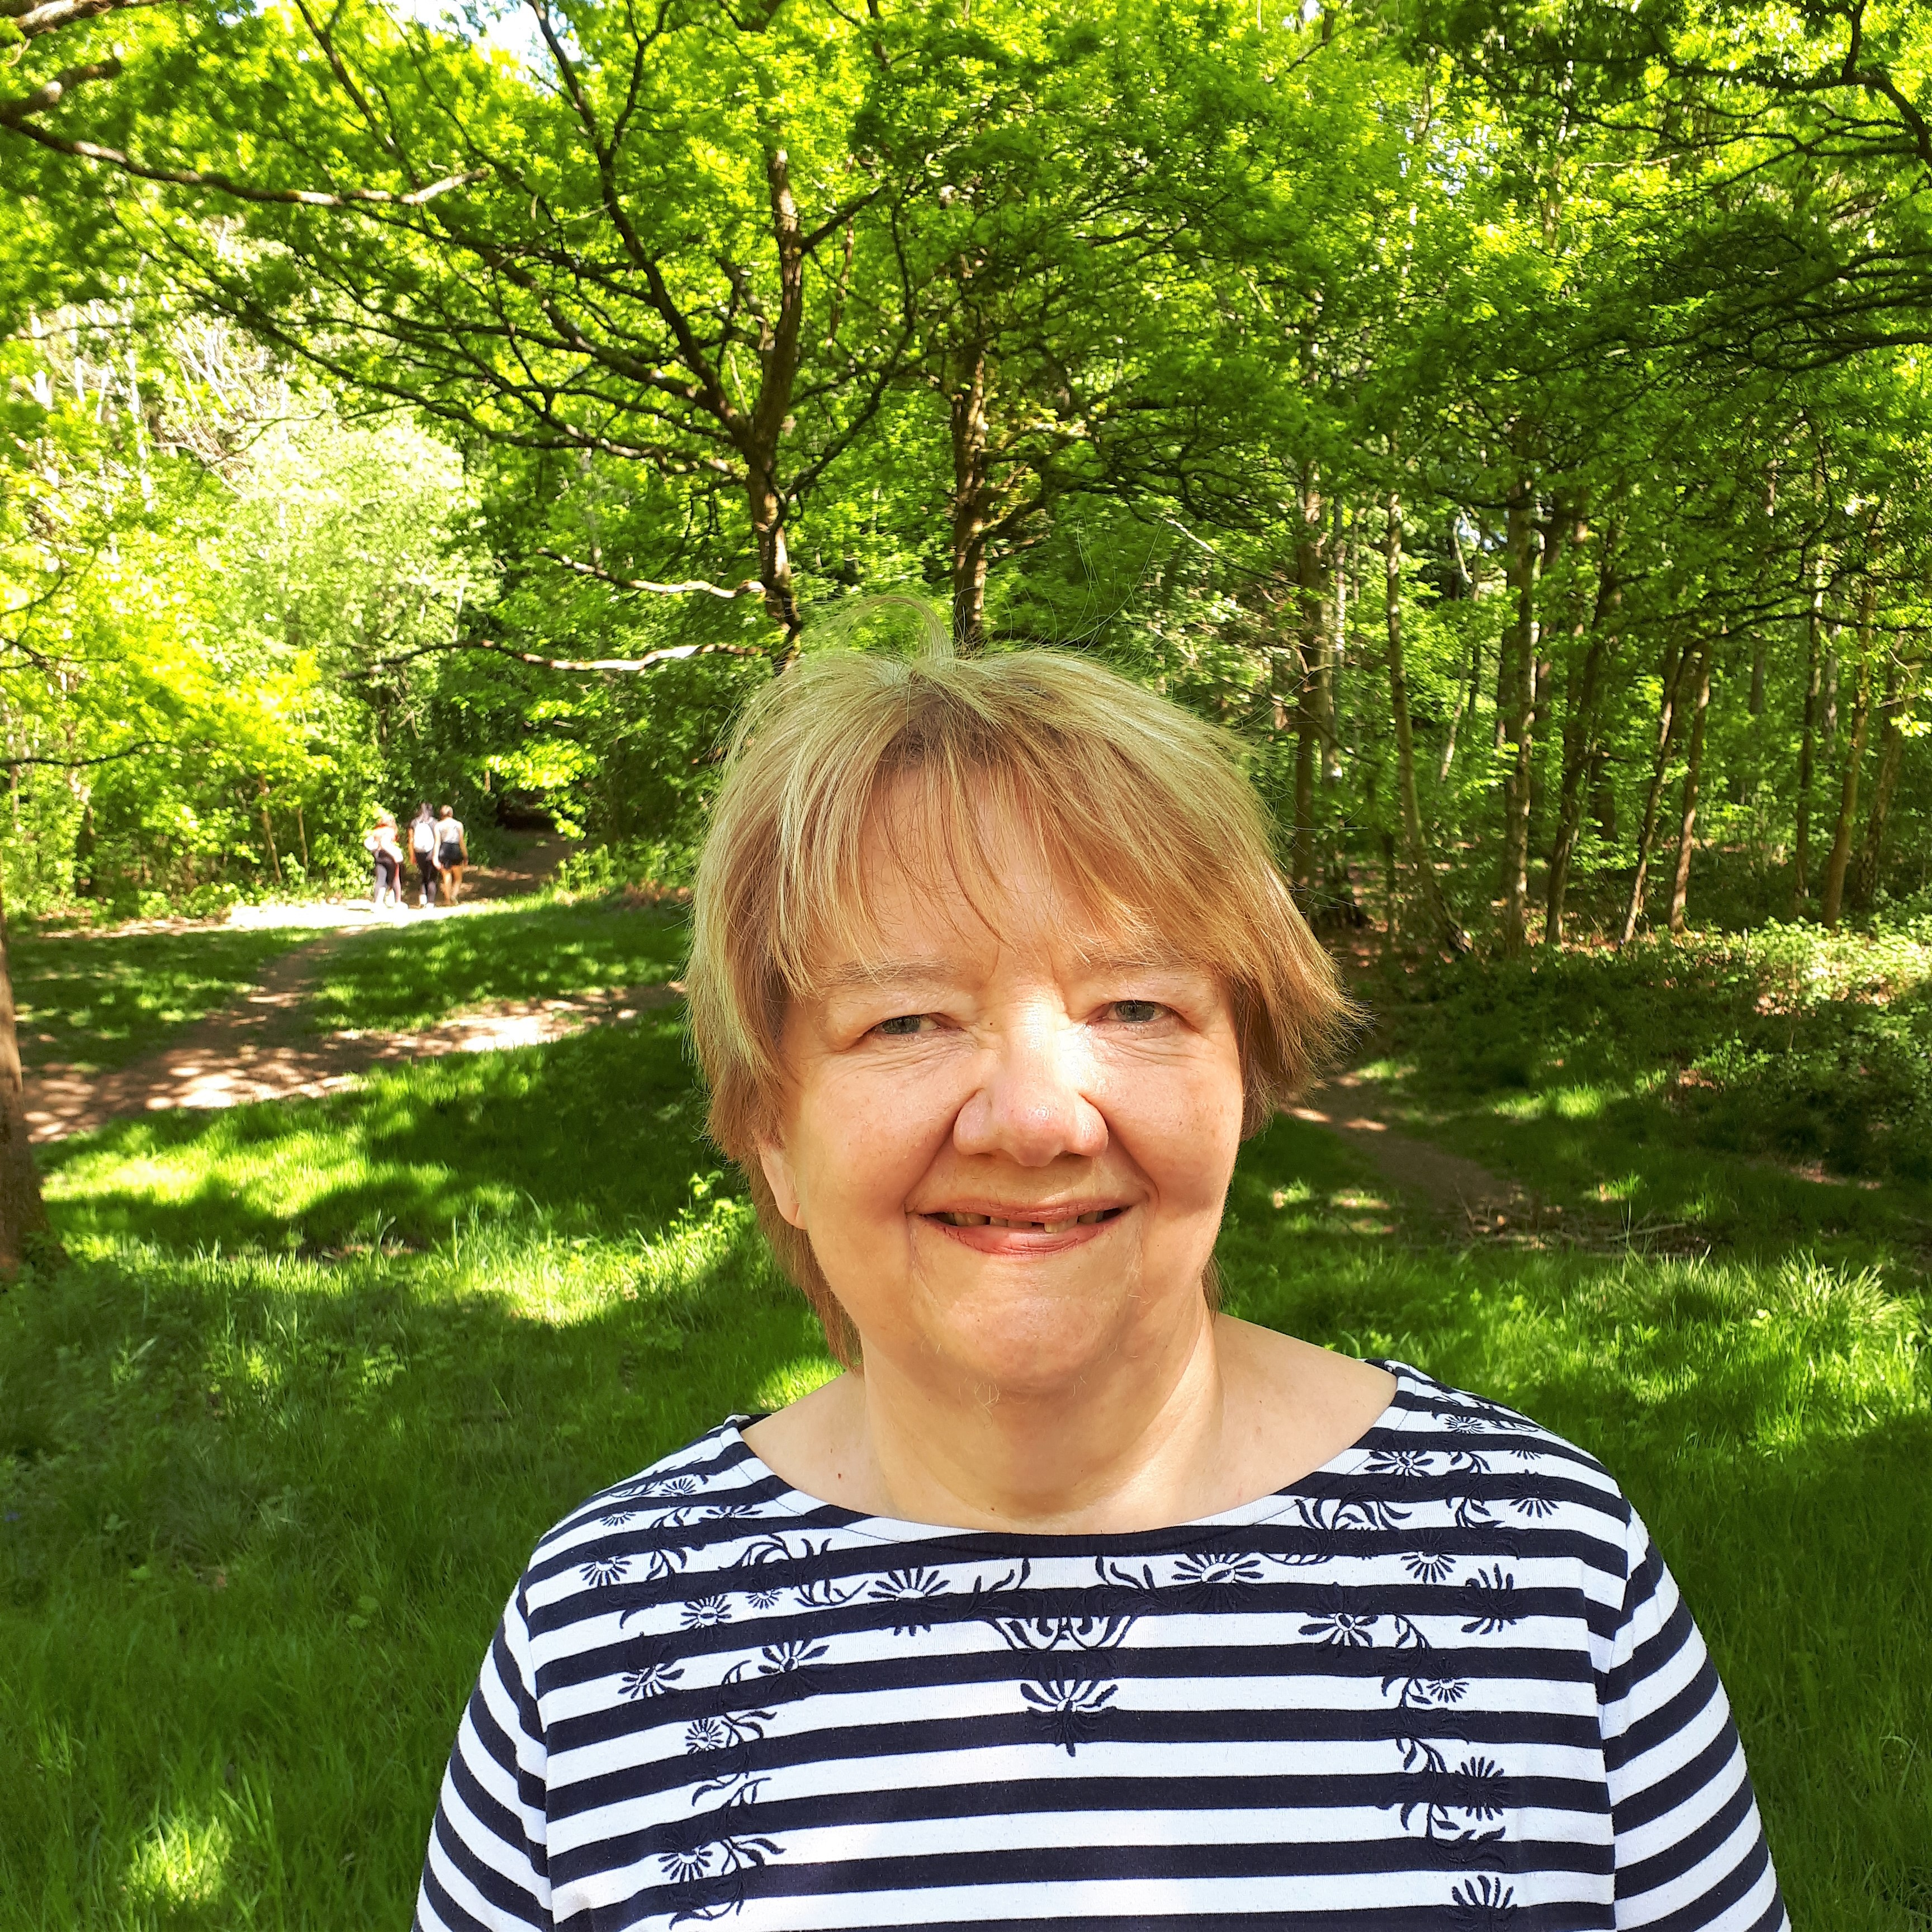 The Viscounts Author photo May 2020 (2)